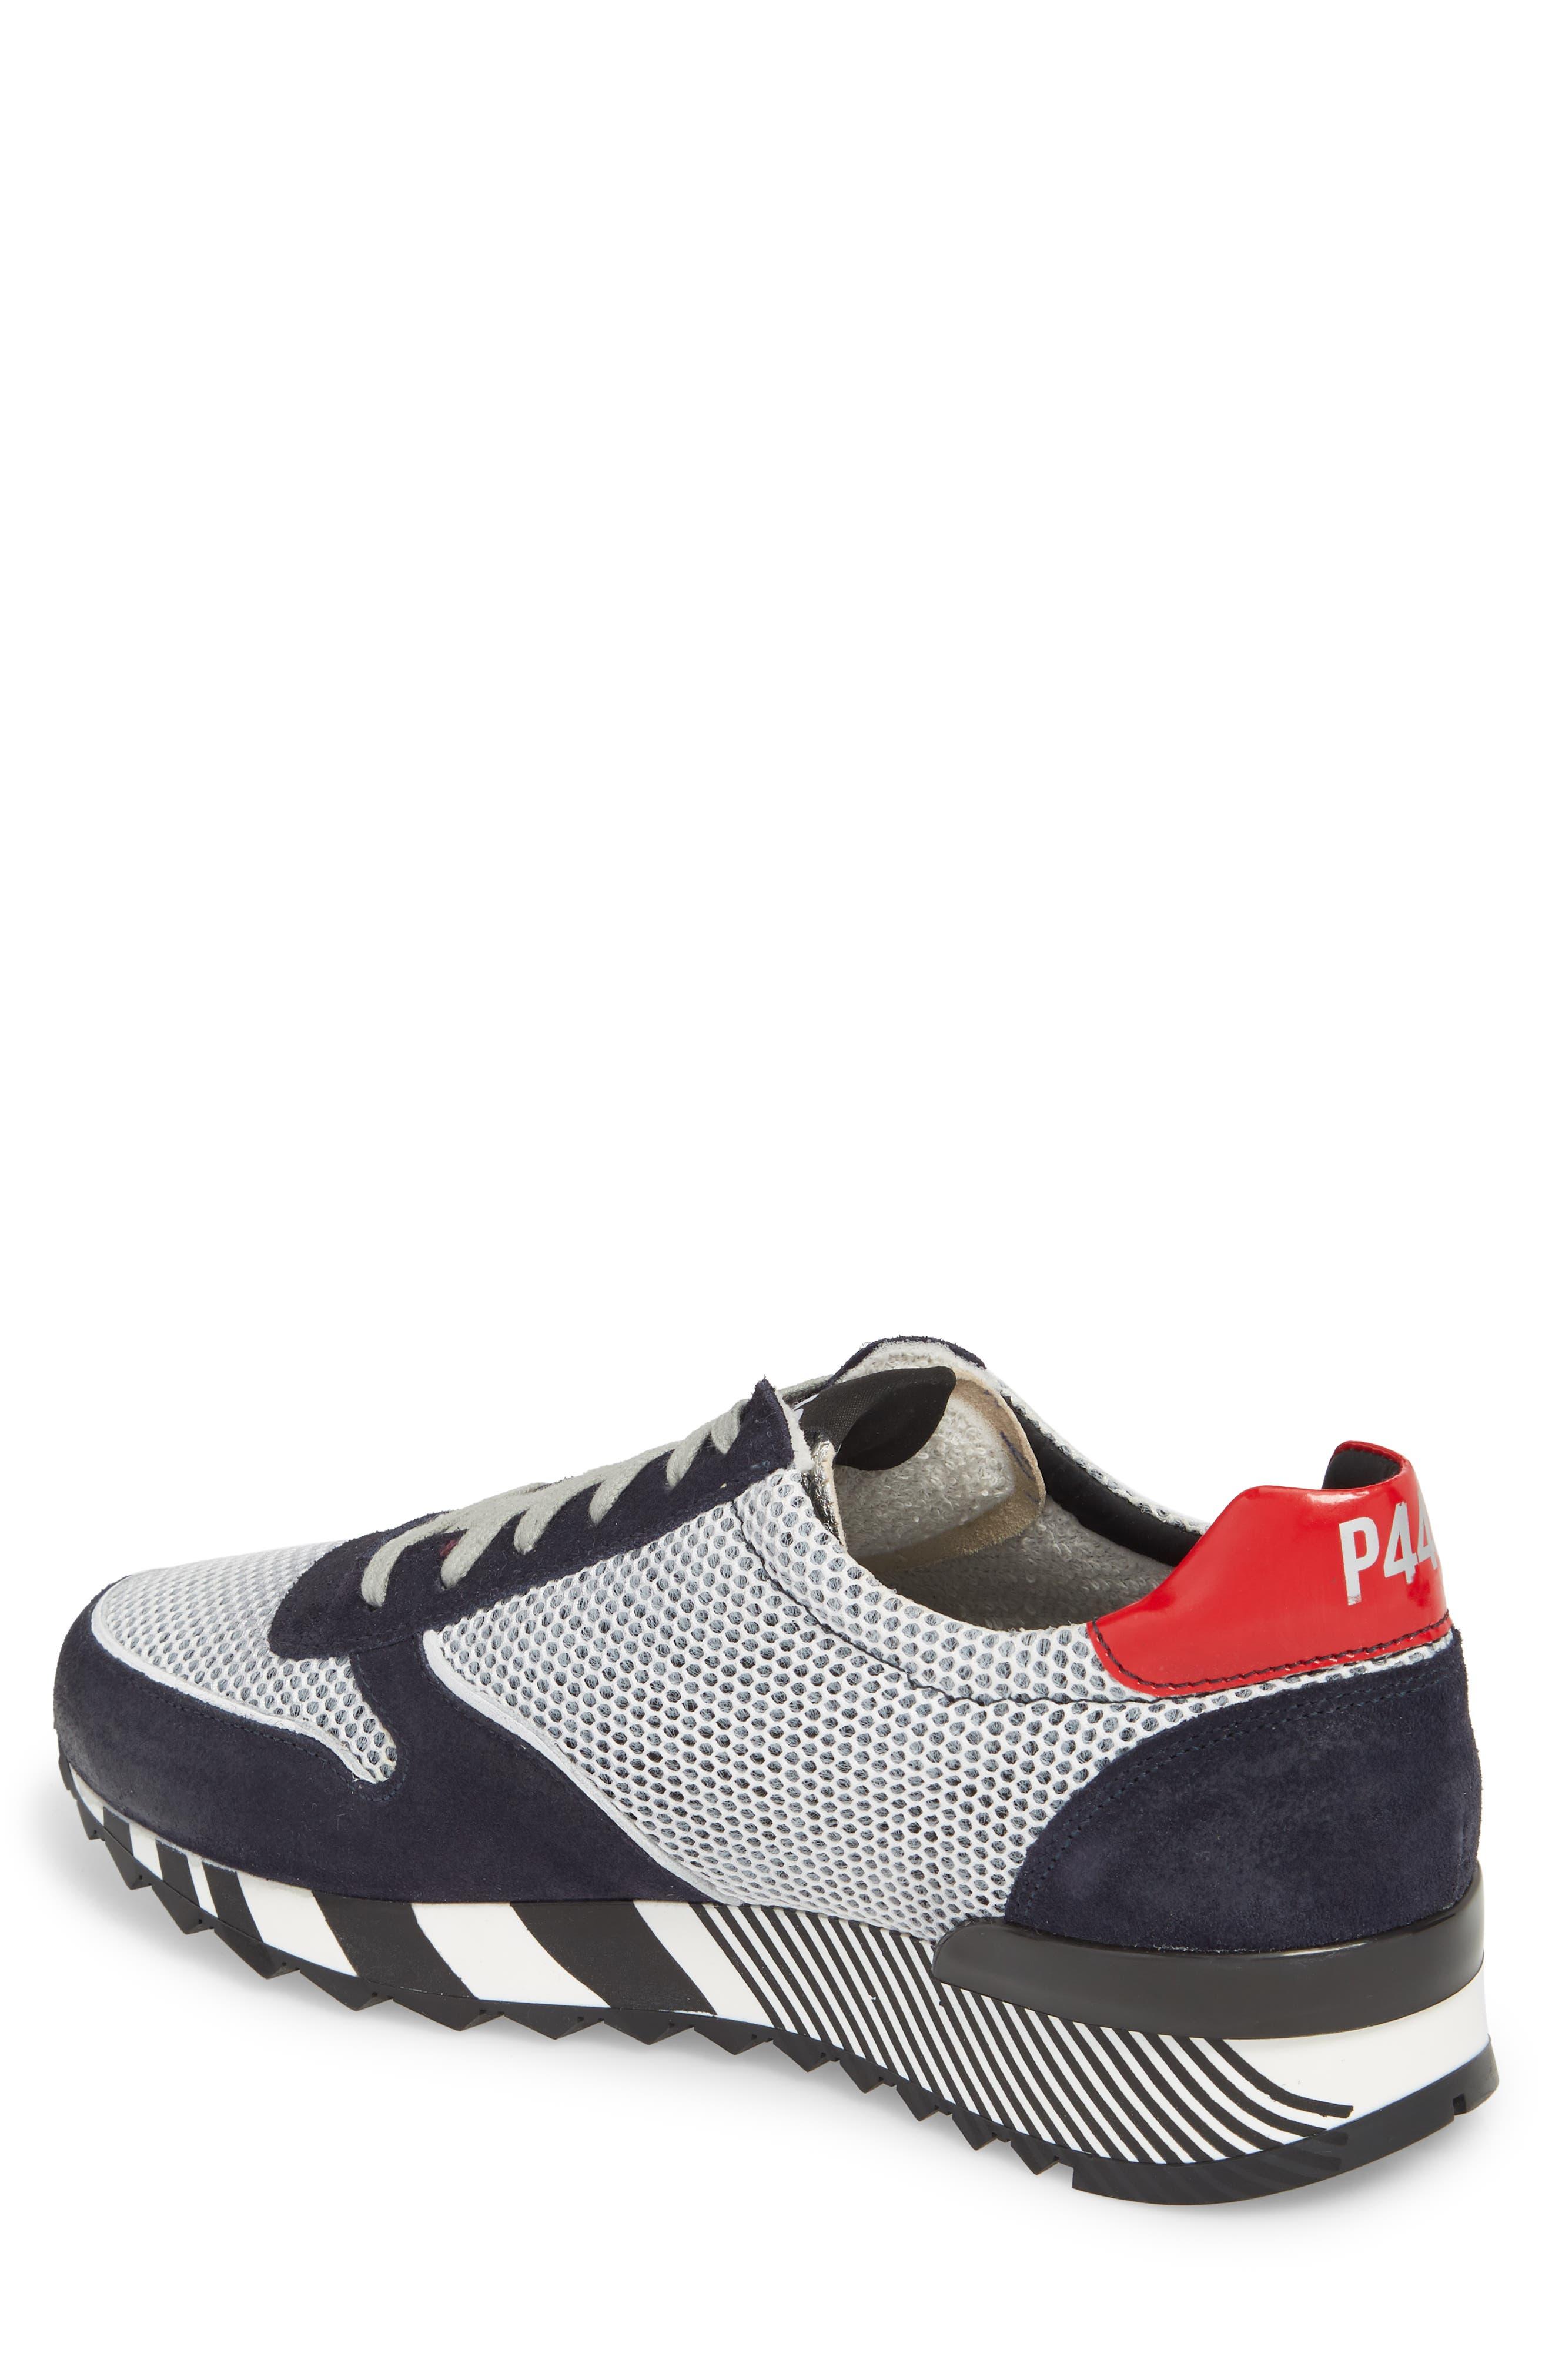 Boston Low Top Sneaker,                             Alternate thumbnail 2, color,                             Sand Grey